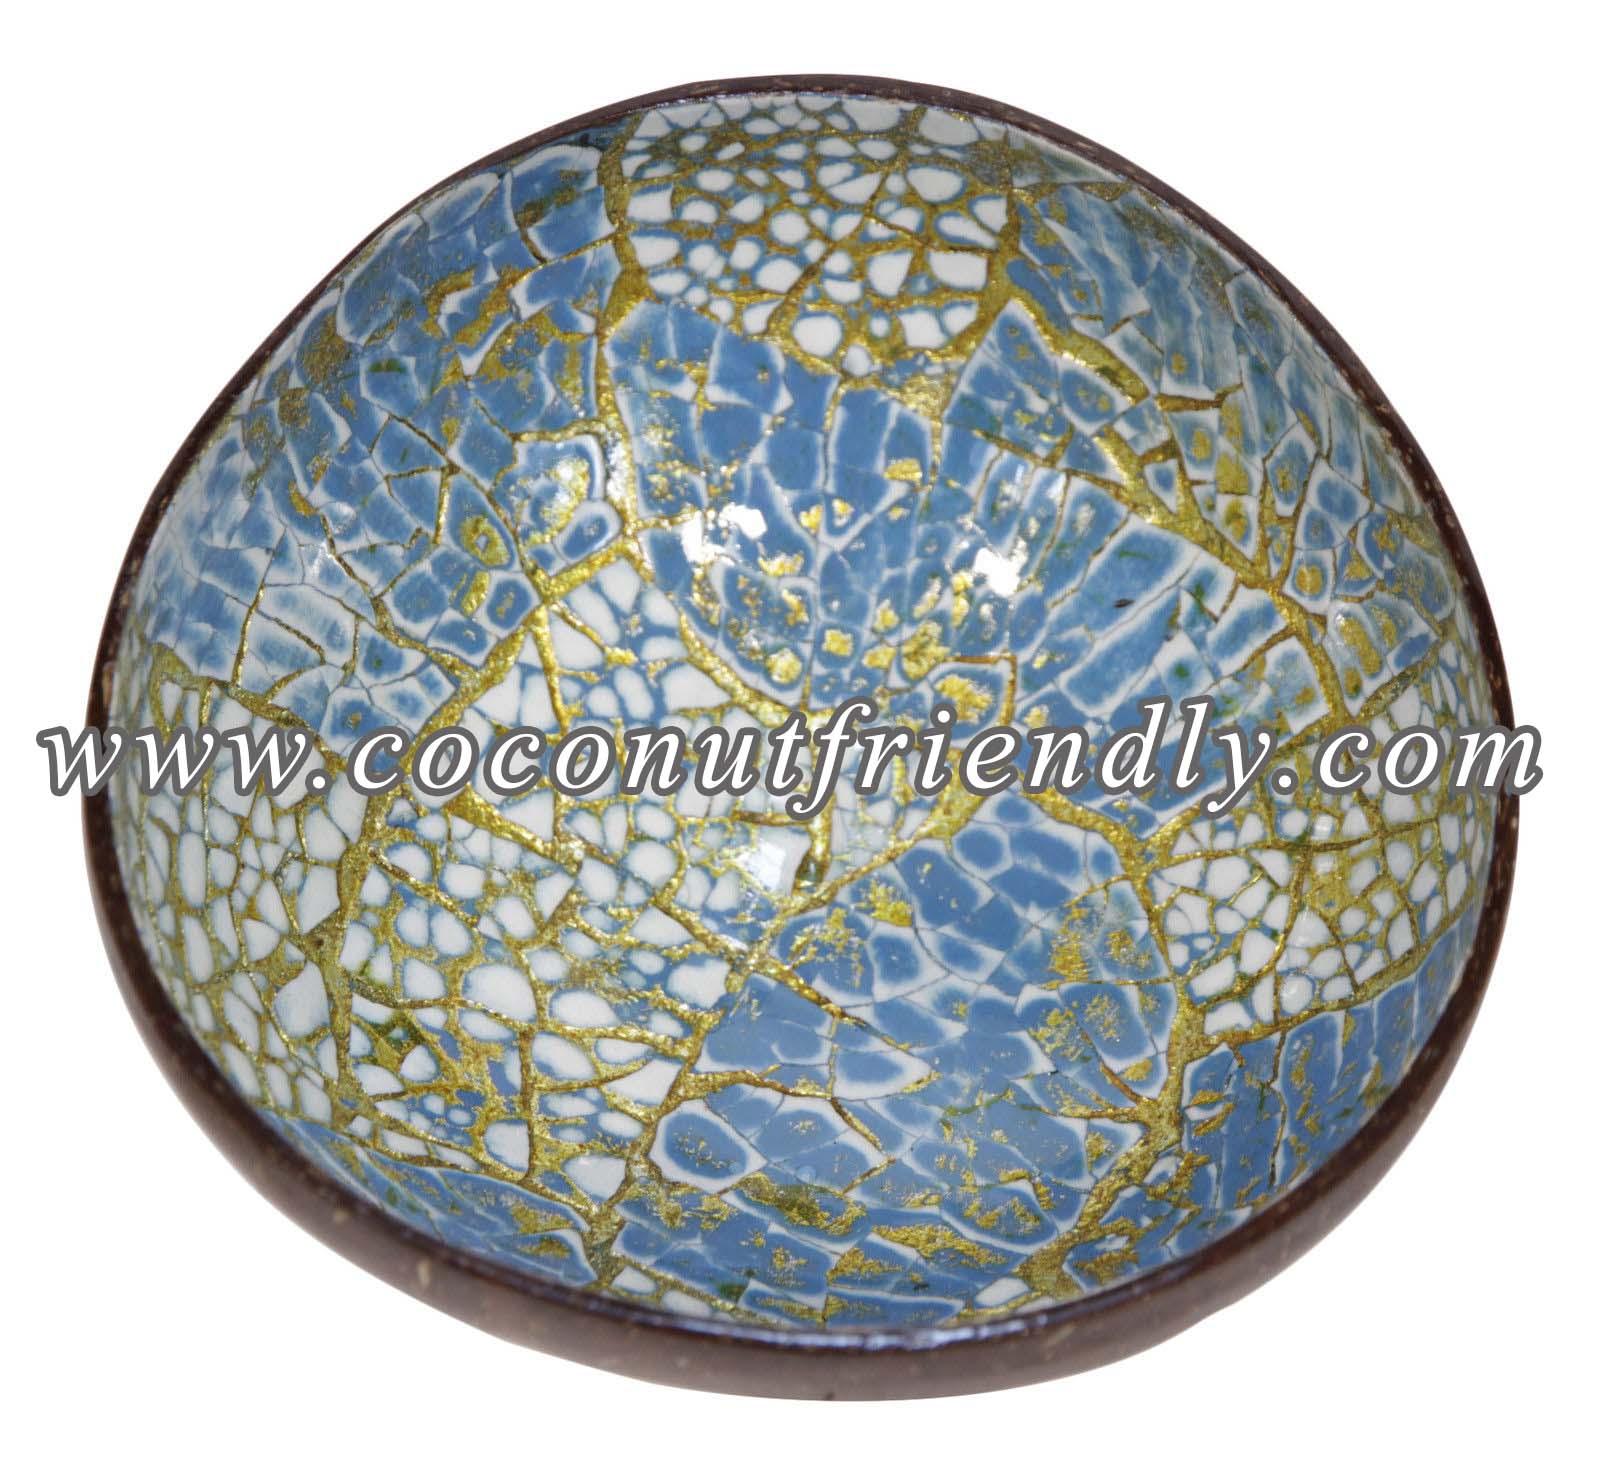 CFCB 1869 – Original Coconut Shell Bowls Wholesale , Lacquer coconut shell bowl with eggshell inlaid Wholesale